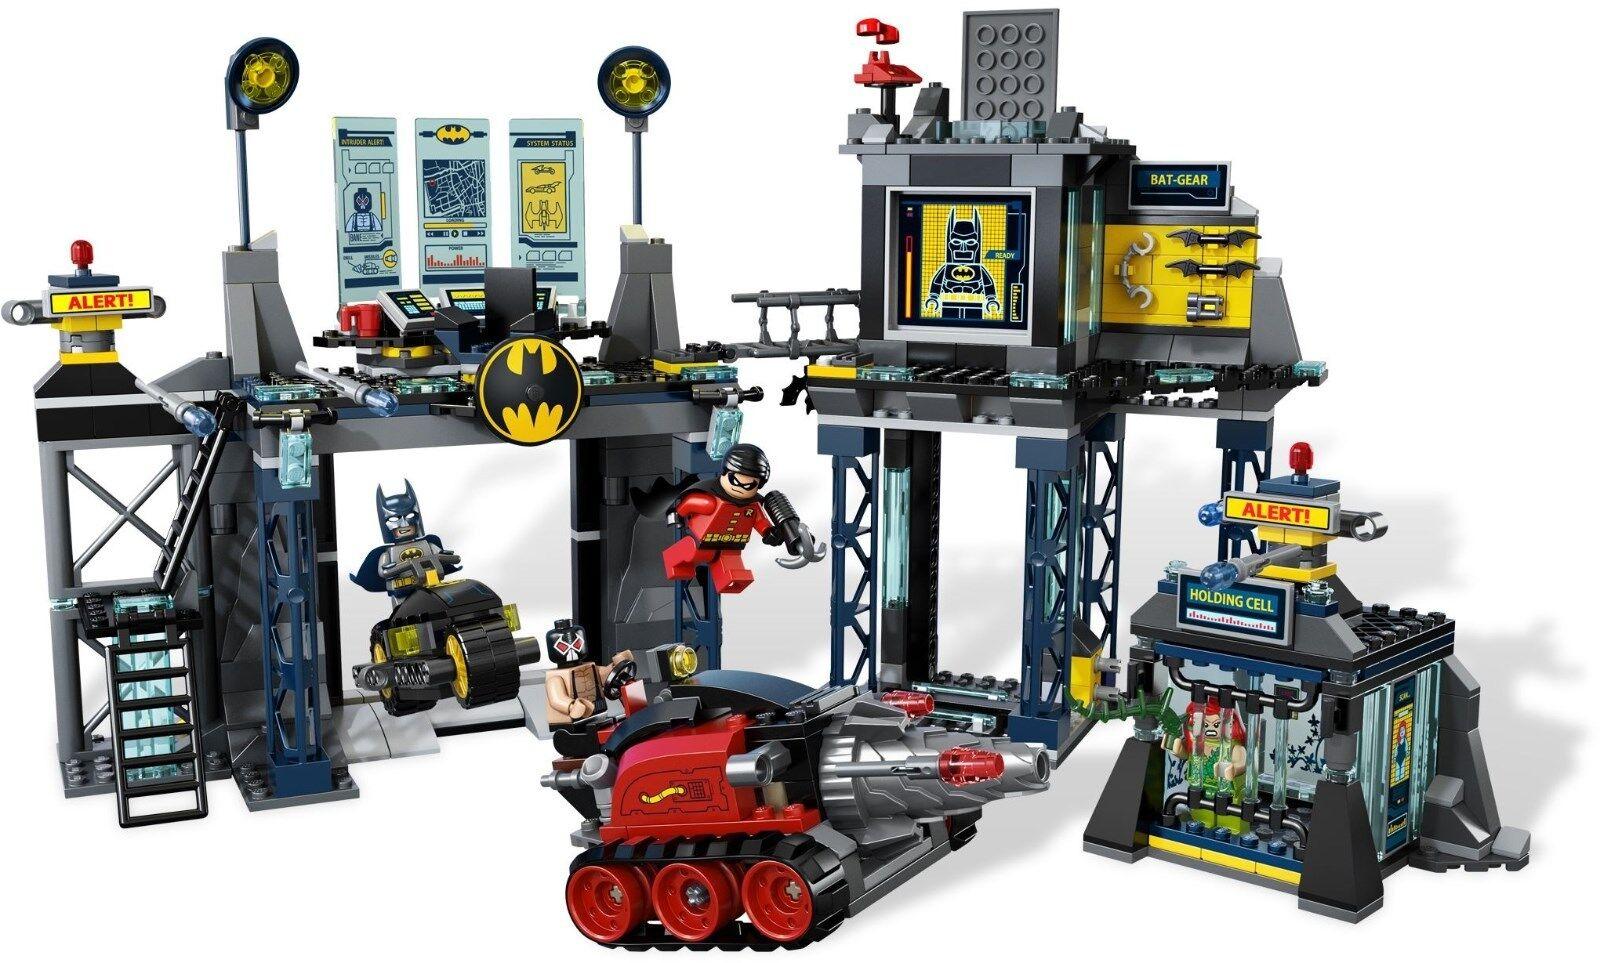 6860 LEGO The Batcave w/ 5 minifigs  Robin, Poison Ivy, Bane, Bruce Wayne  - Nuovo